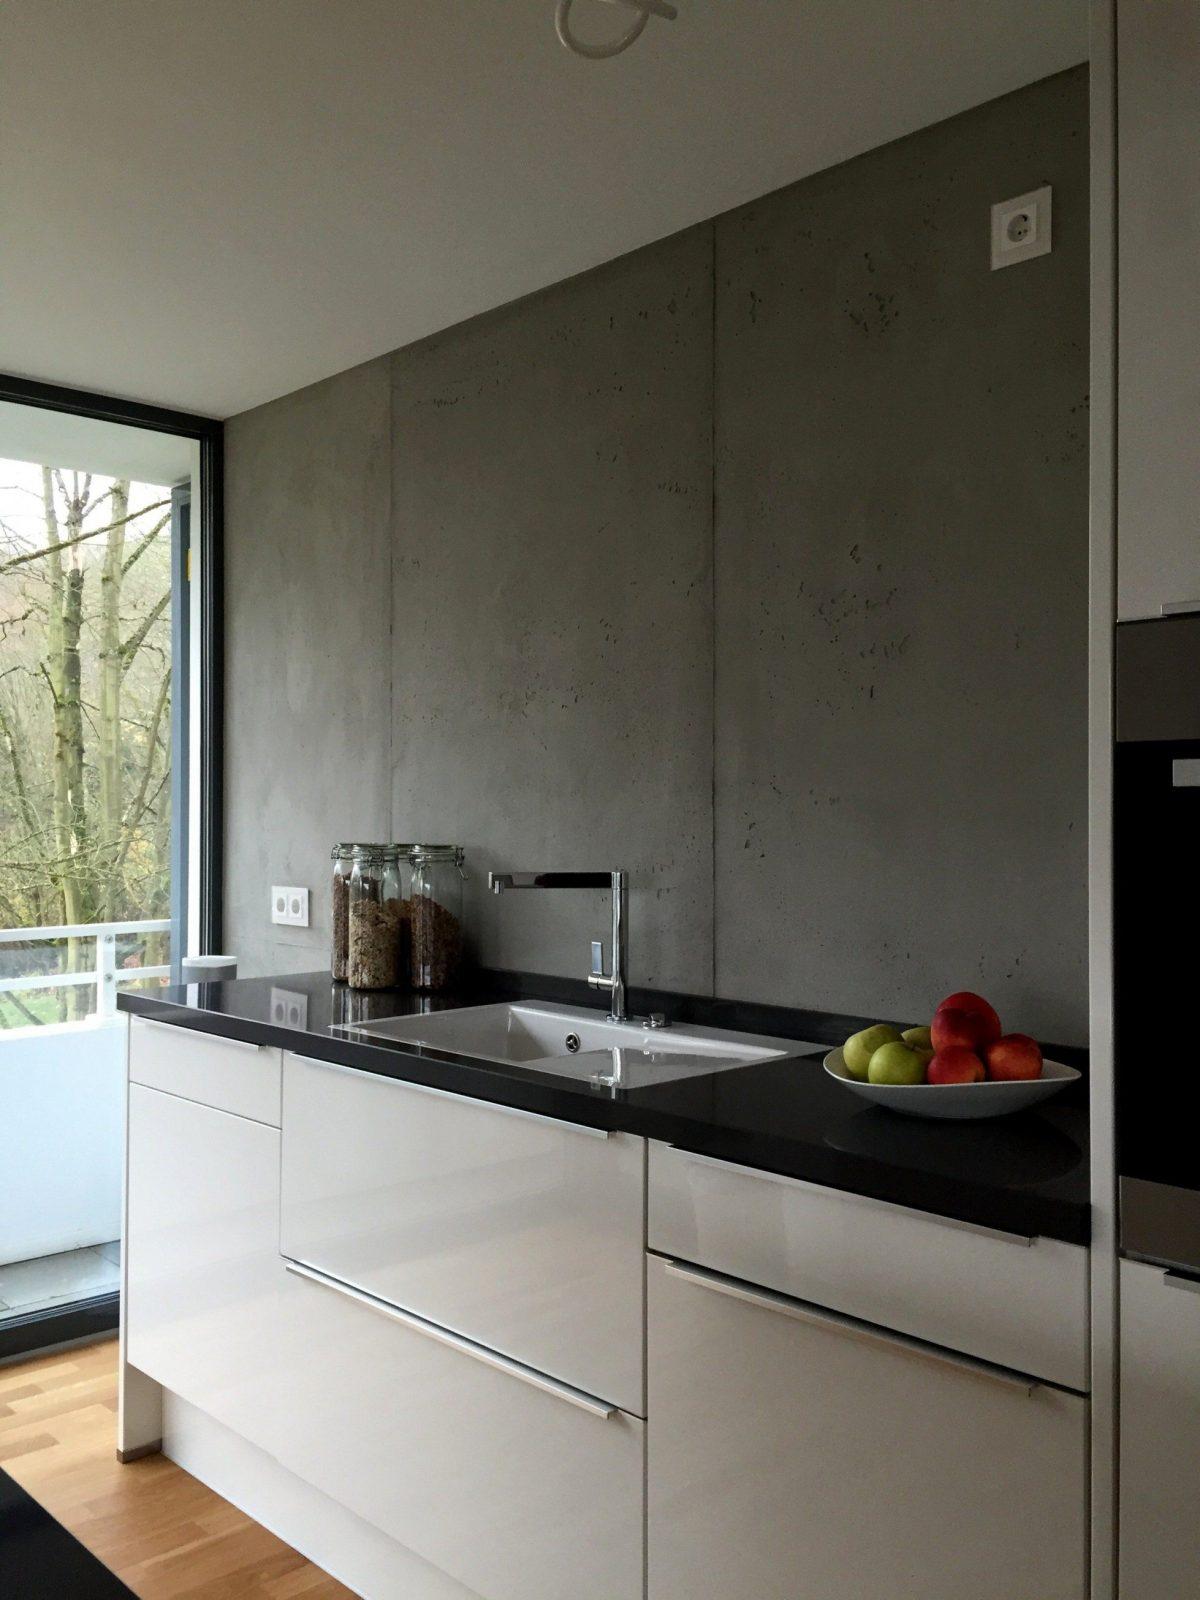 Beste Spritzschutz Küche Selber Machen Ideen 3892 von Spritzschutz Küche Plexiglas Selber Machen Bild